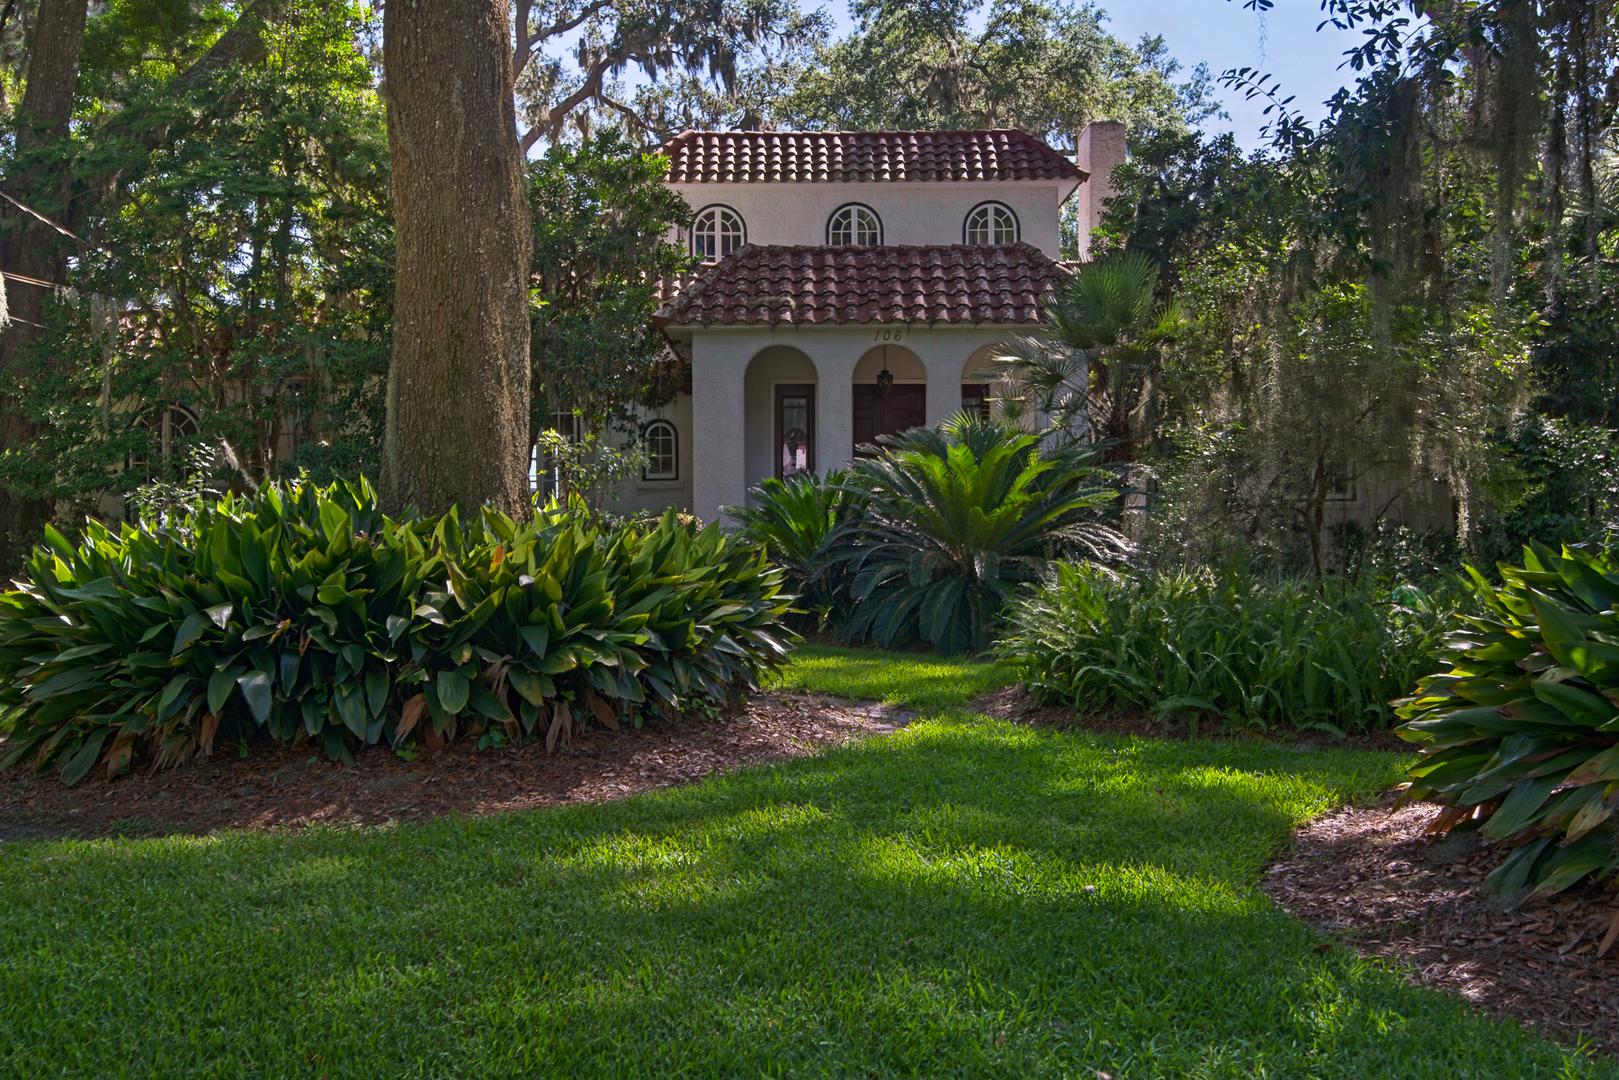 Landscape Architecture - Excellence in Exterior Design